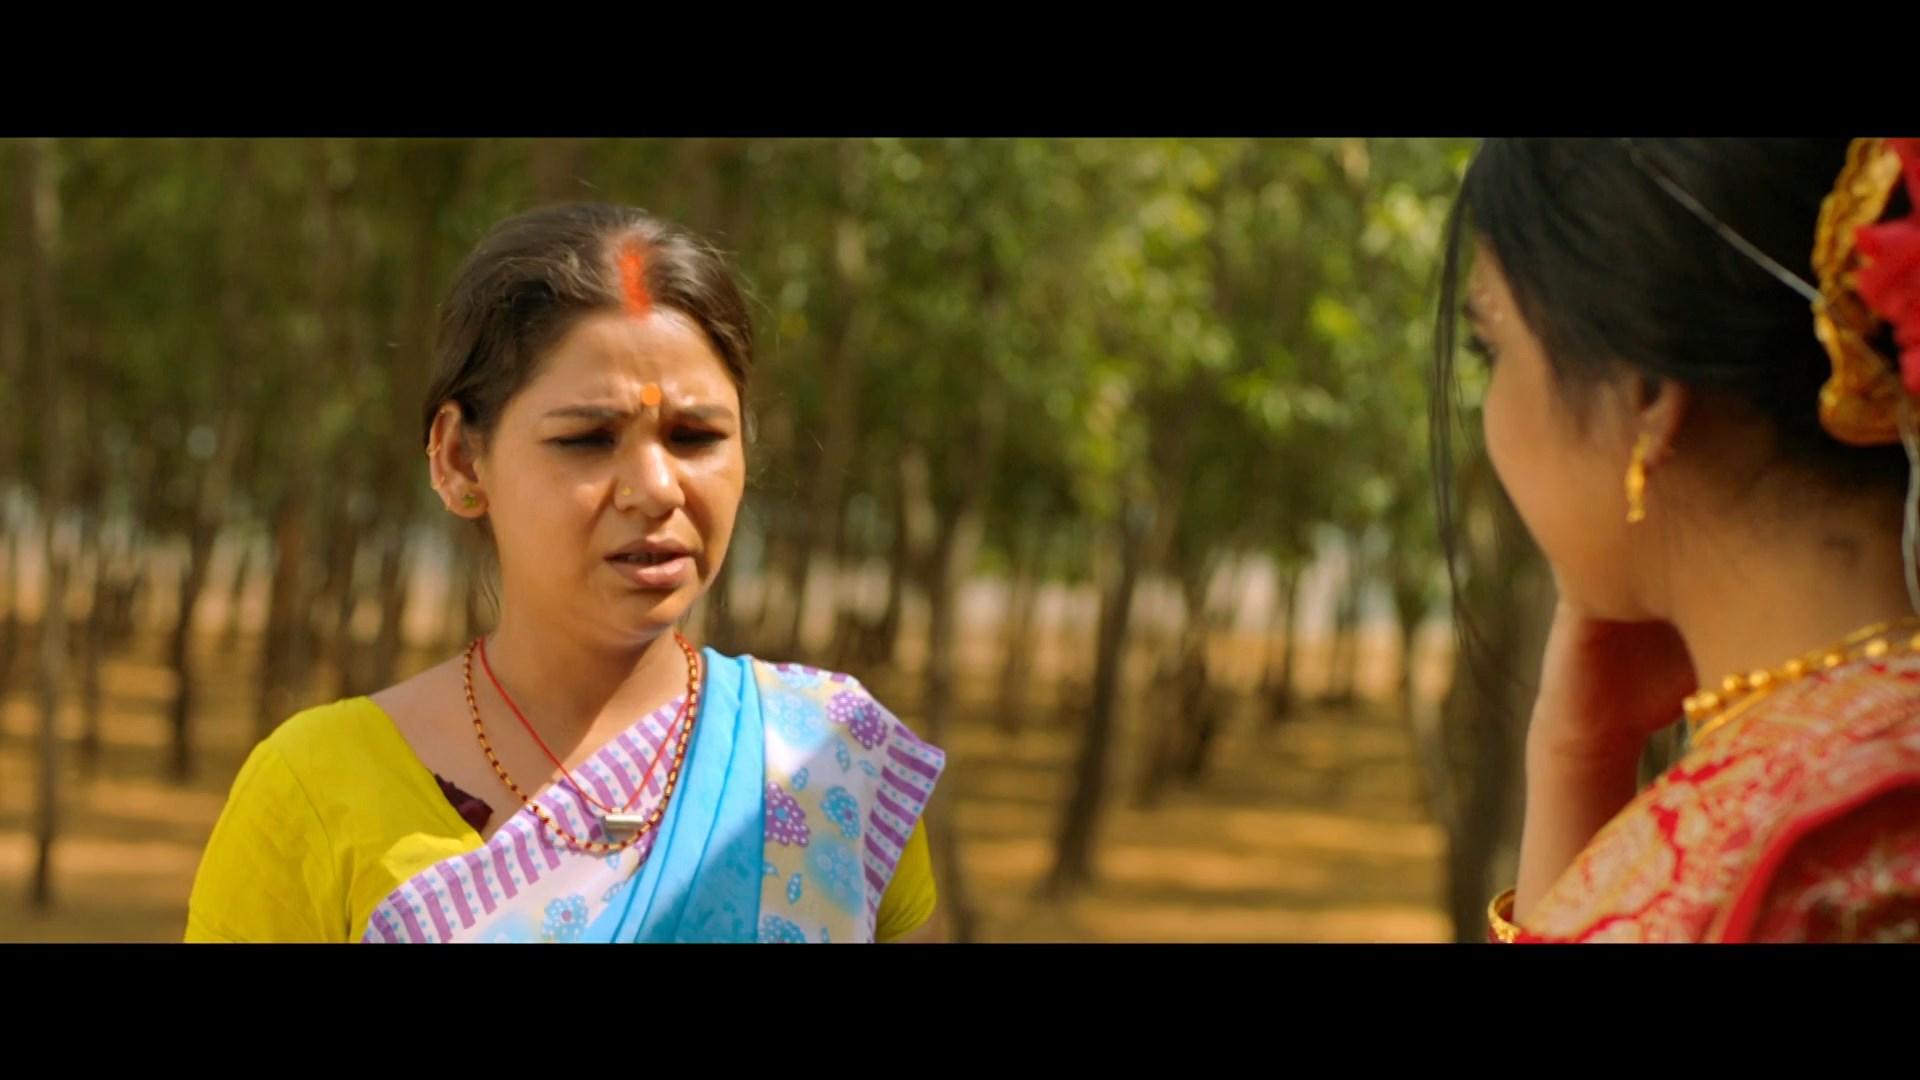 Uronchondi.2018.Bengali.1080p.WEB.DL.AVC.AAC.DUS.ICTV.mkv snapshot 00.06.06.000